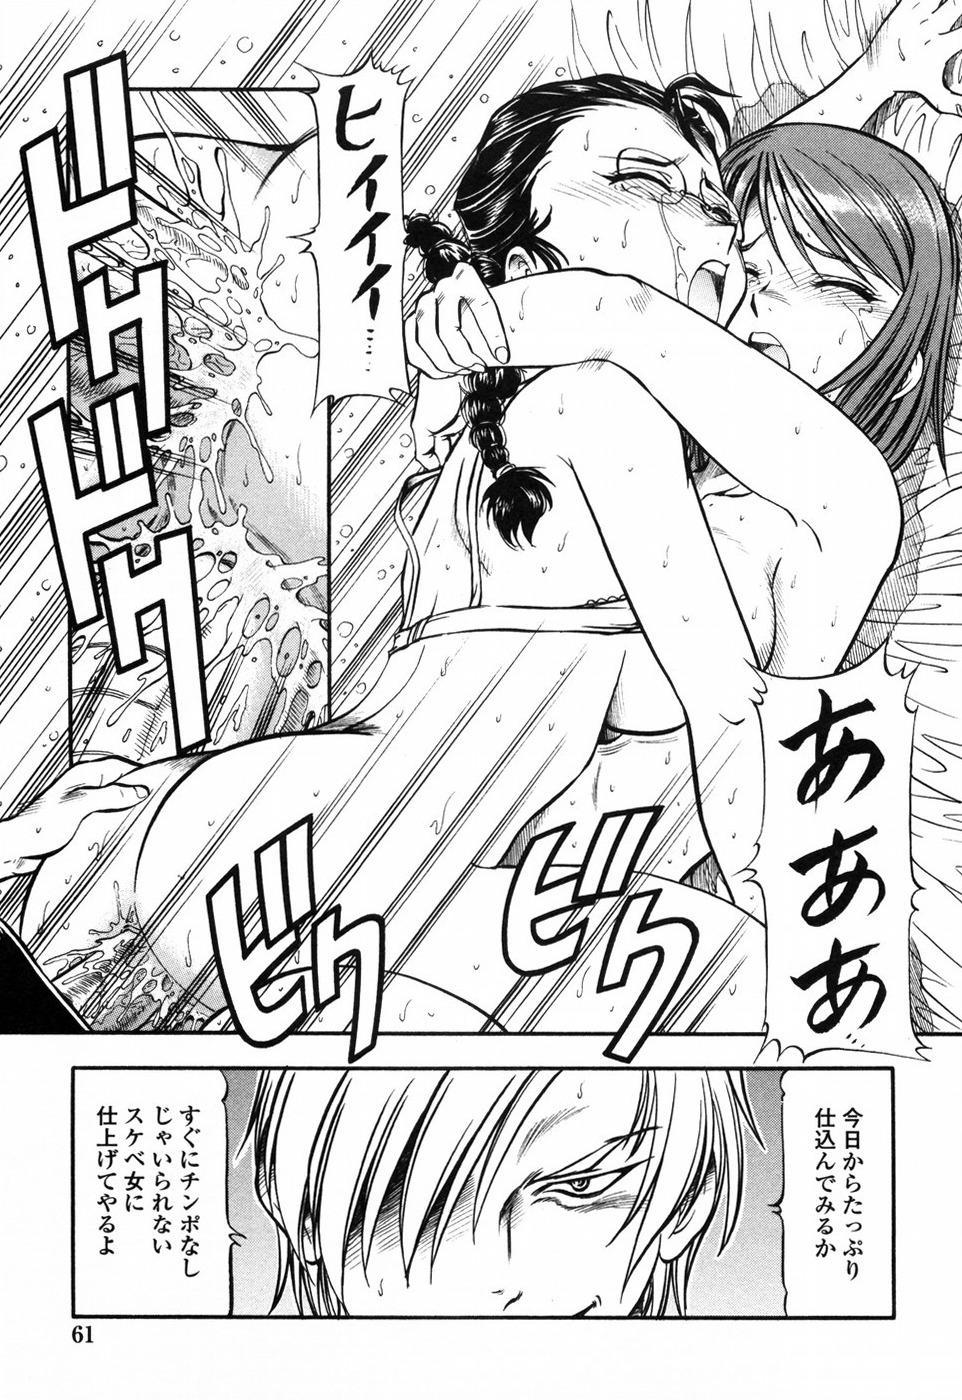 Kichiku Houteishiki - Equation of brutal person 66